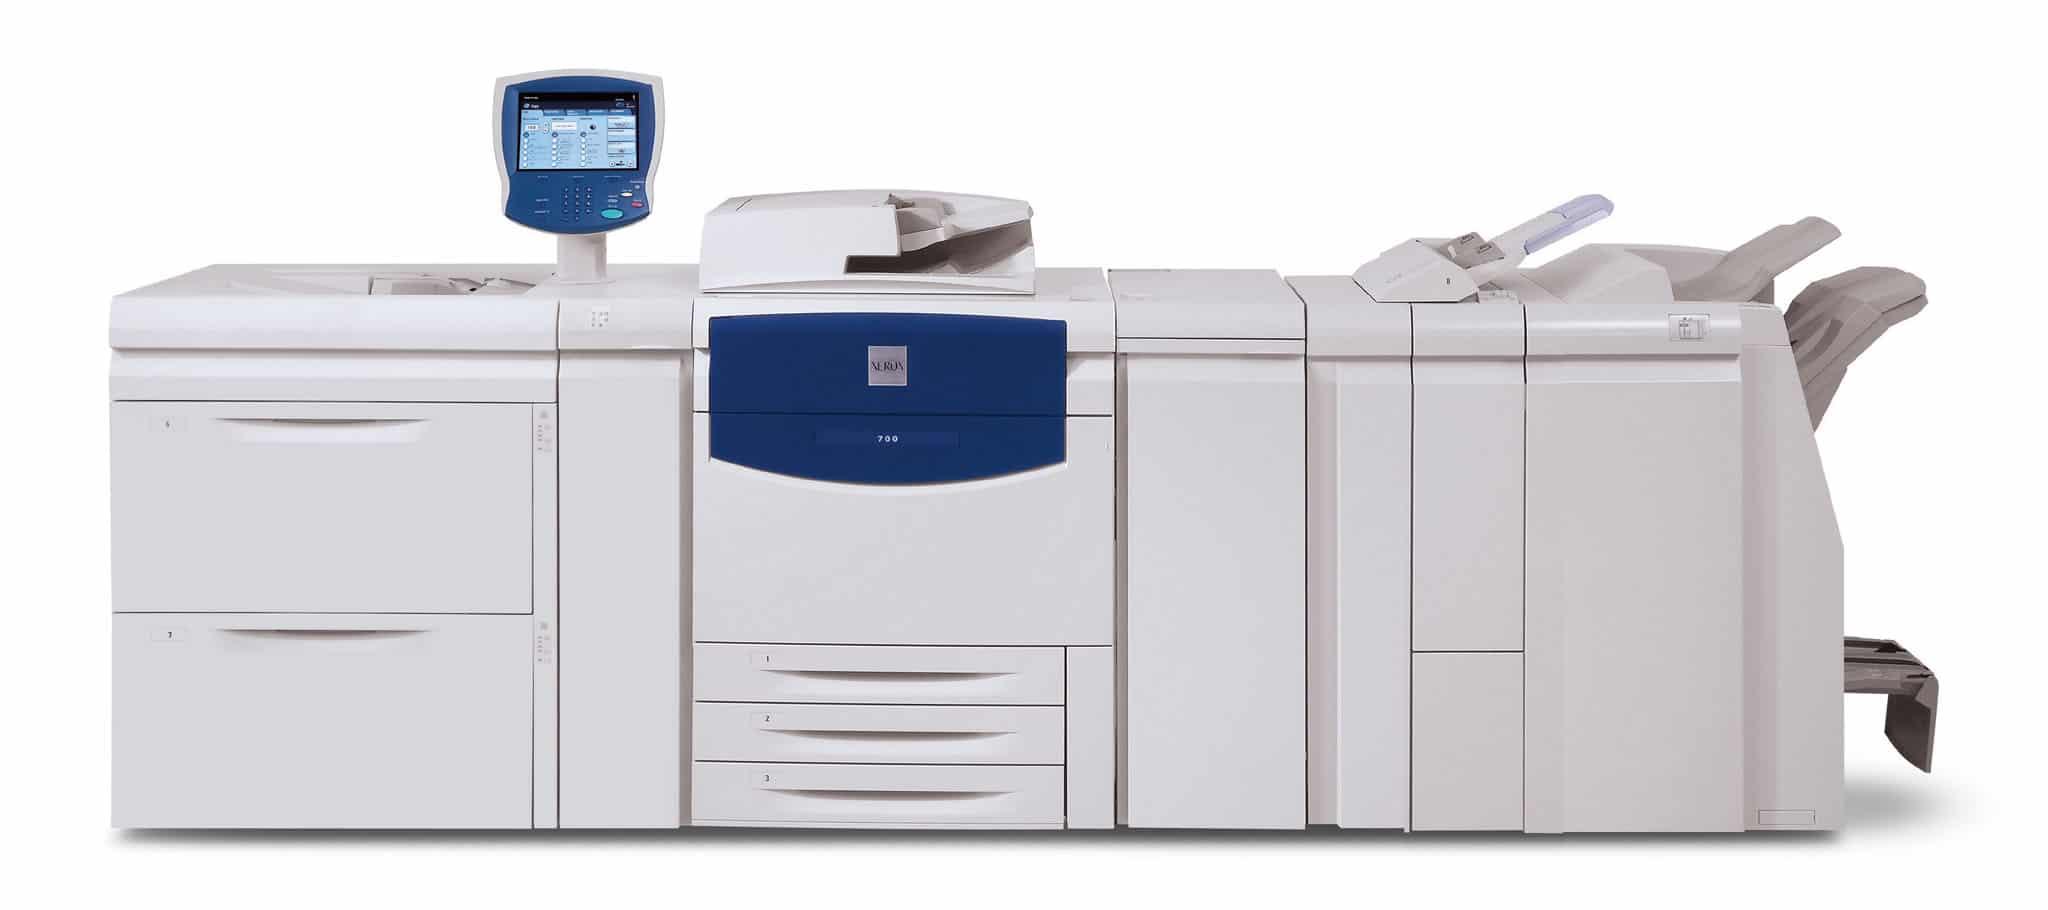 Color press printing - Color Press Printing 32